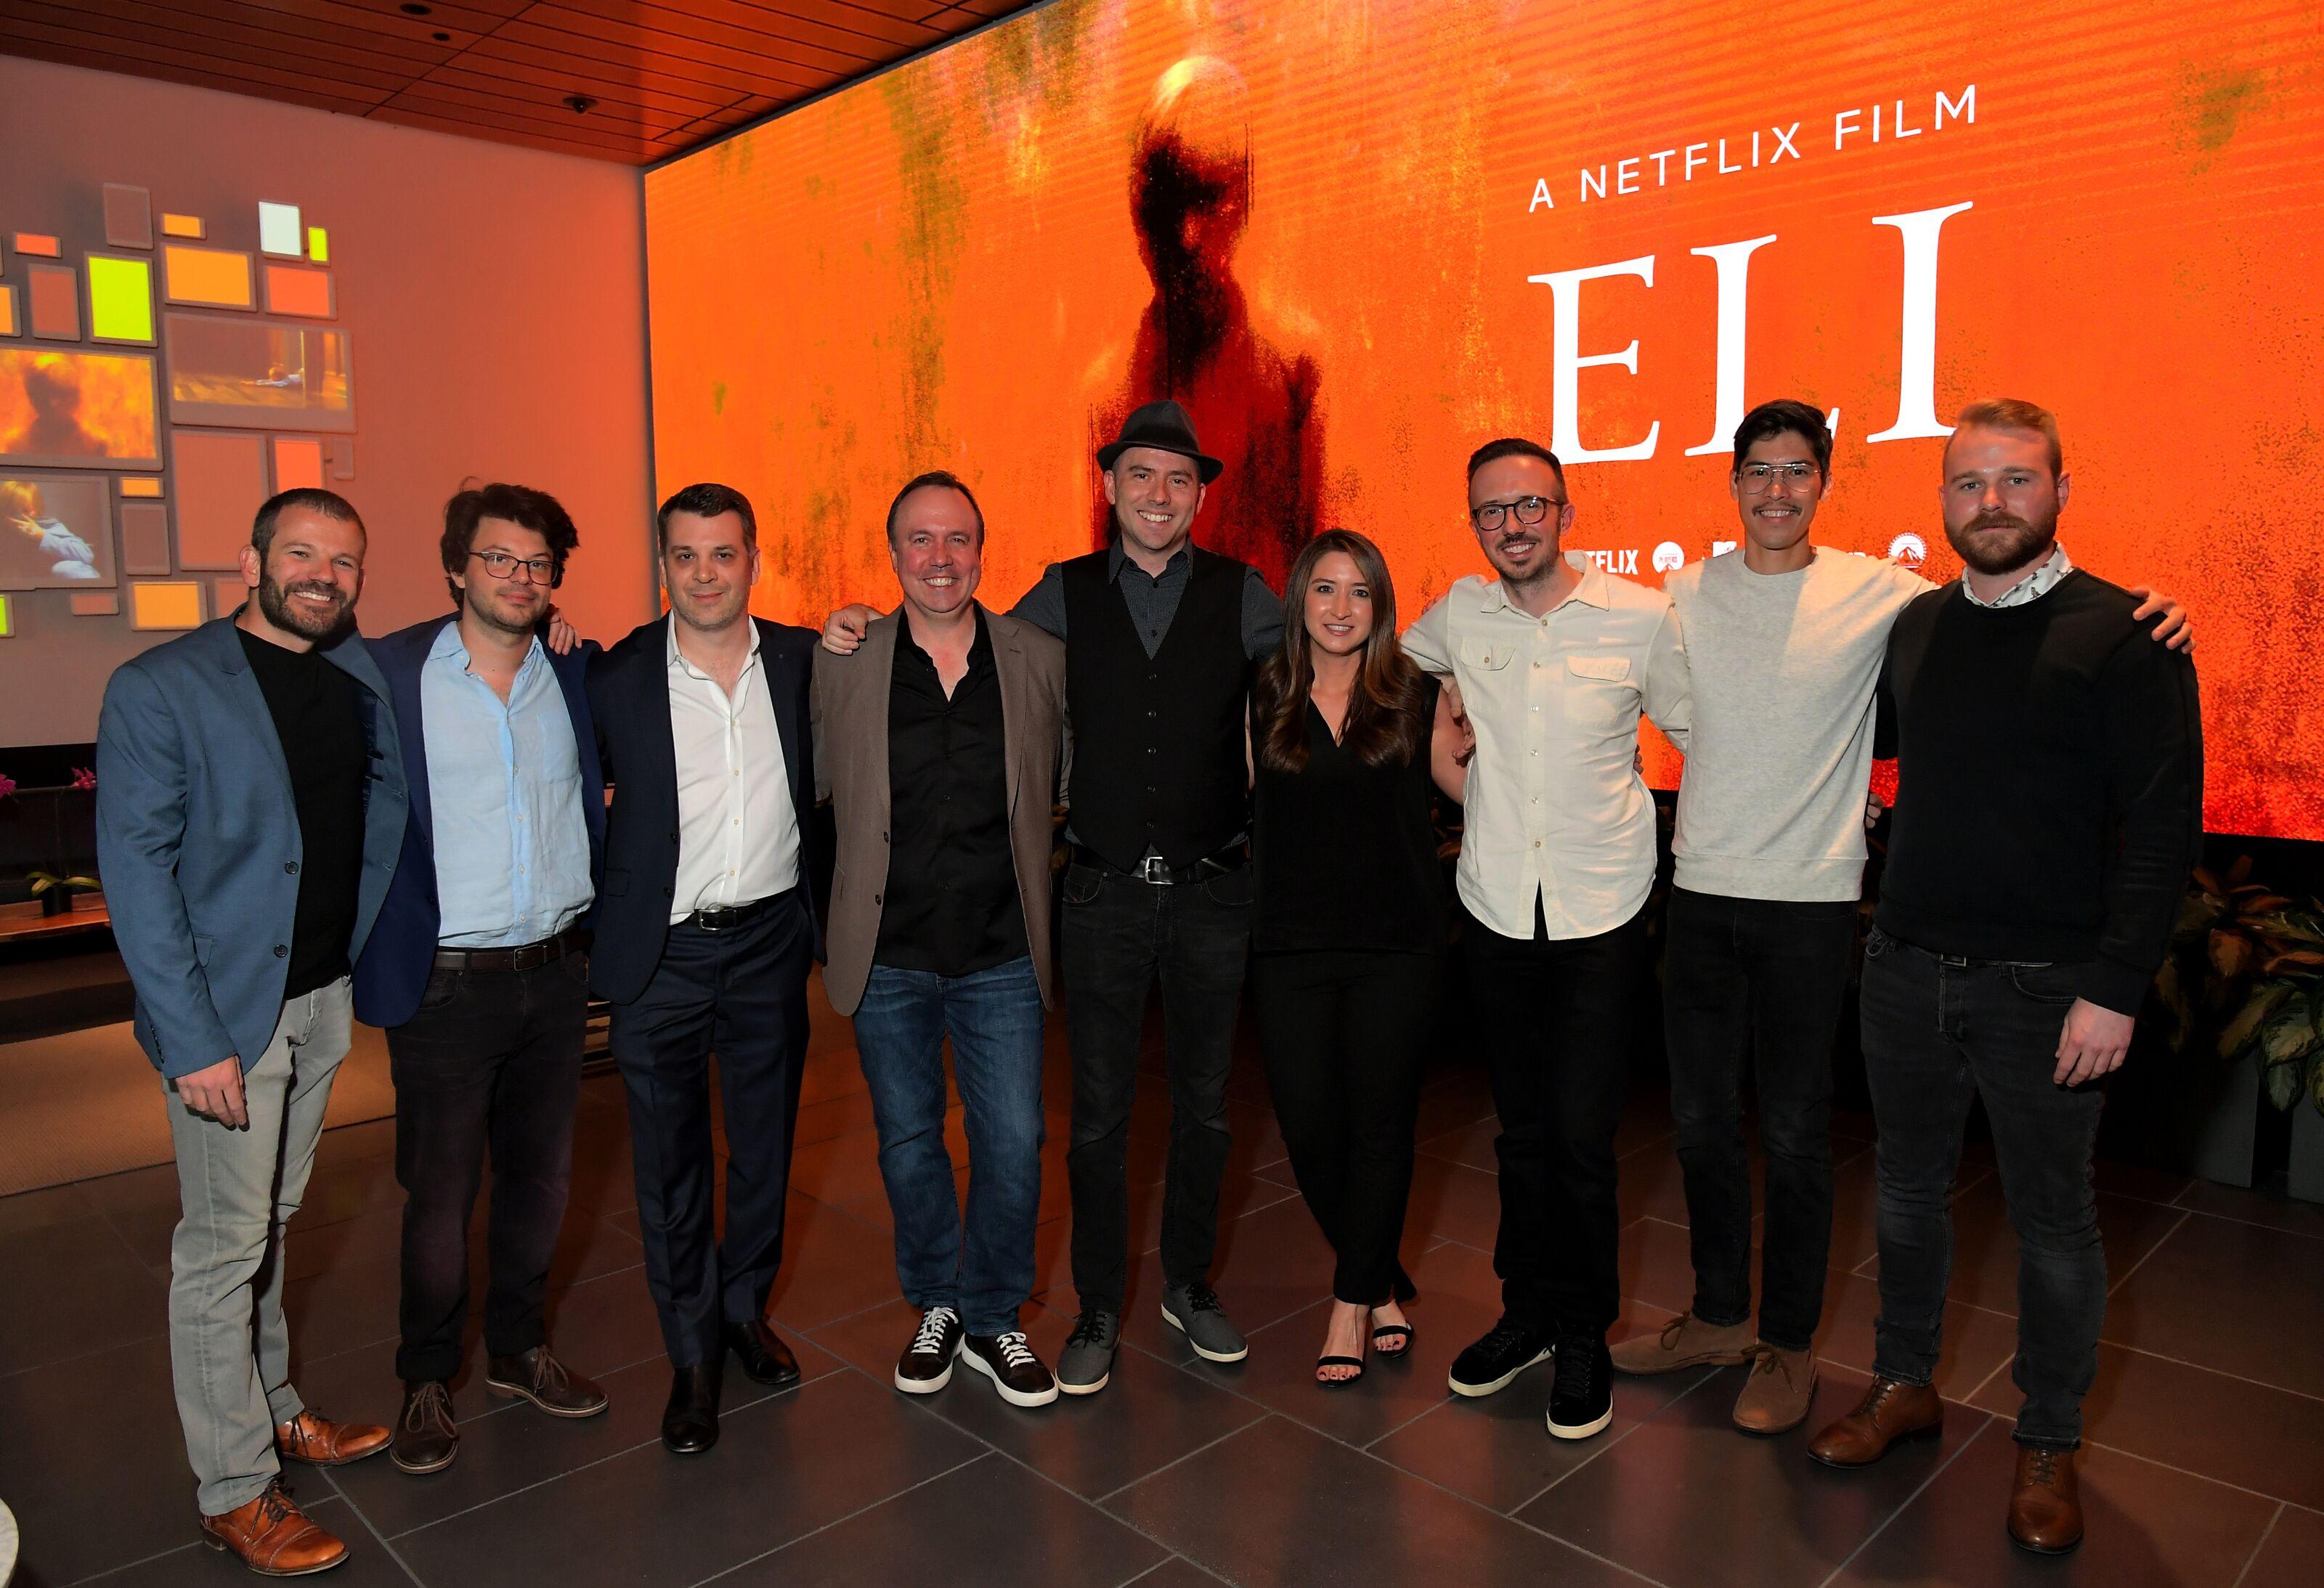 New Netflix thriller Eli has ties to Fear the Walking Dead